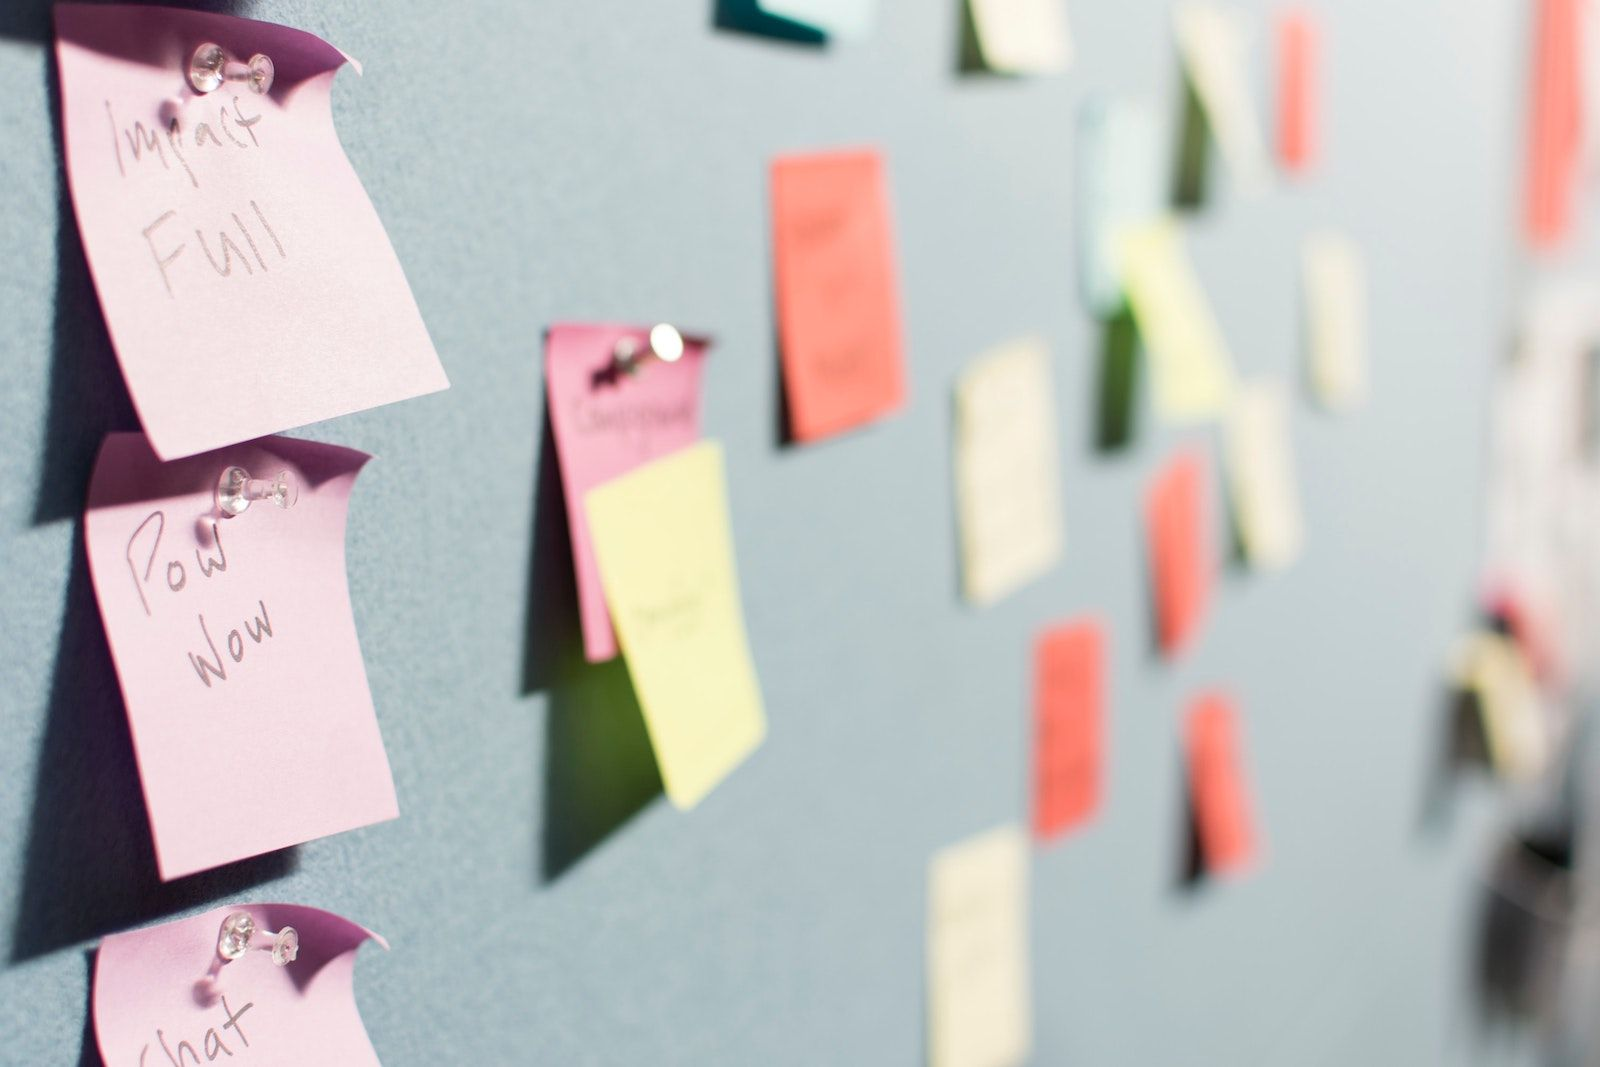 Options in Entrepreneurship post it notes